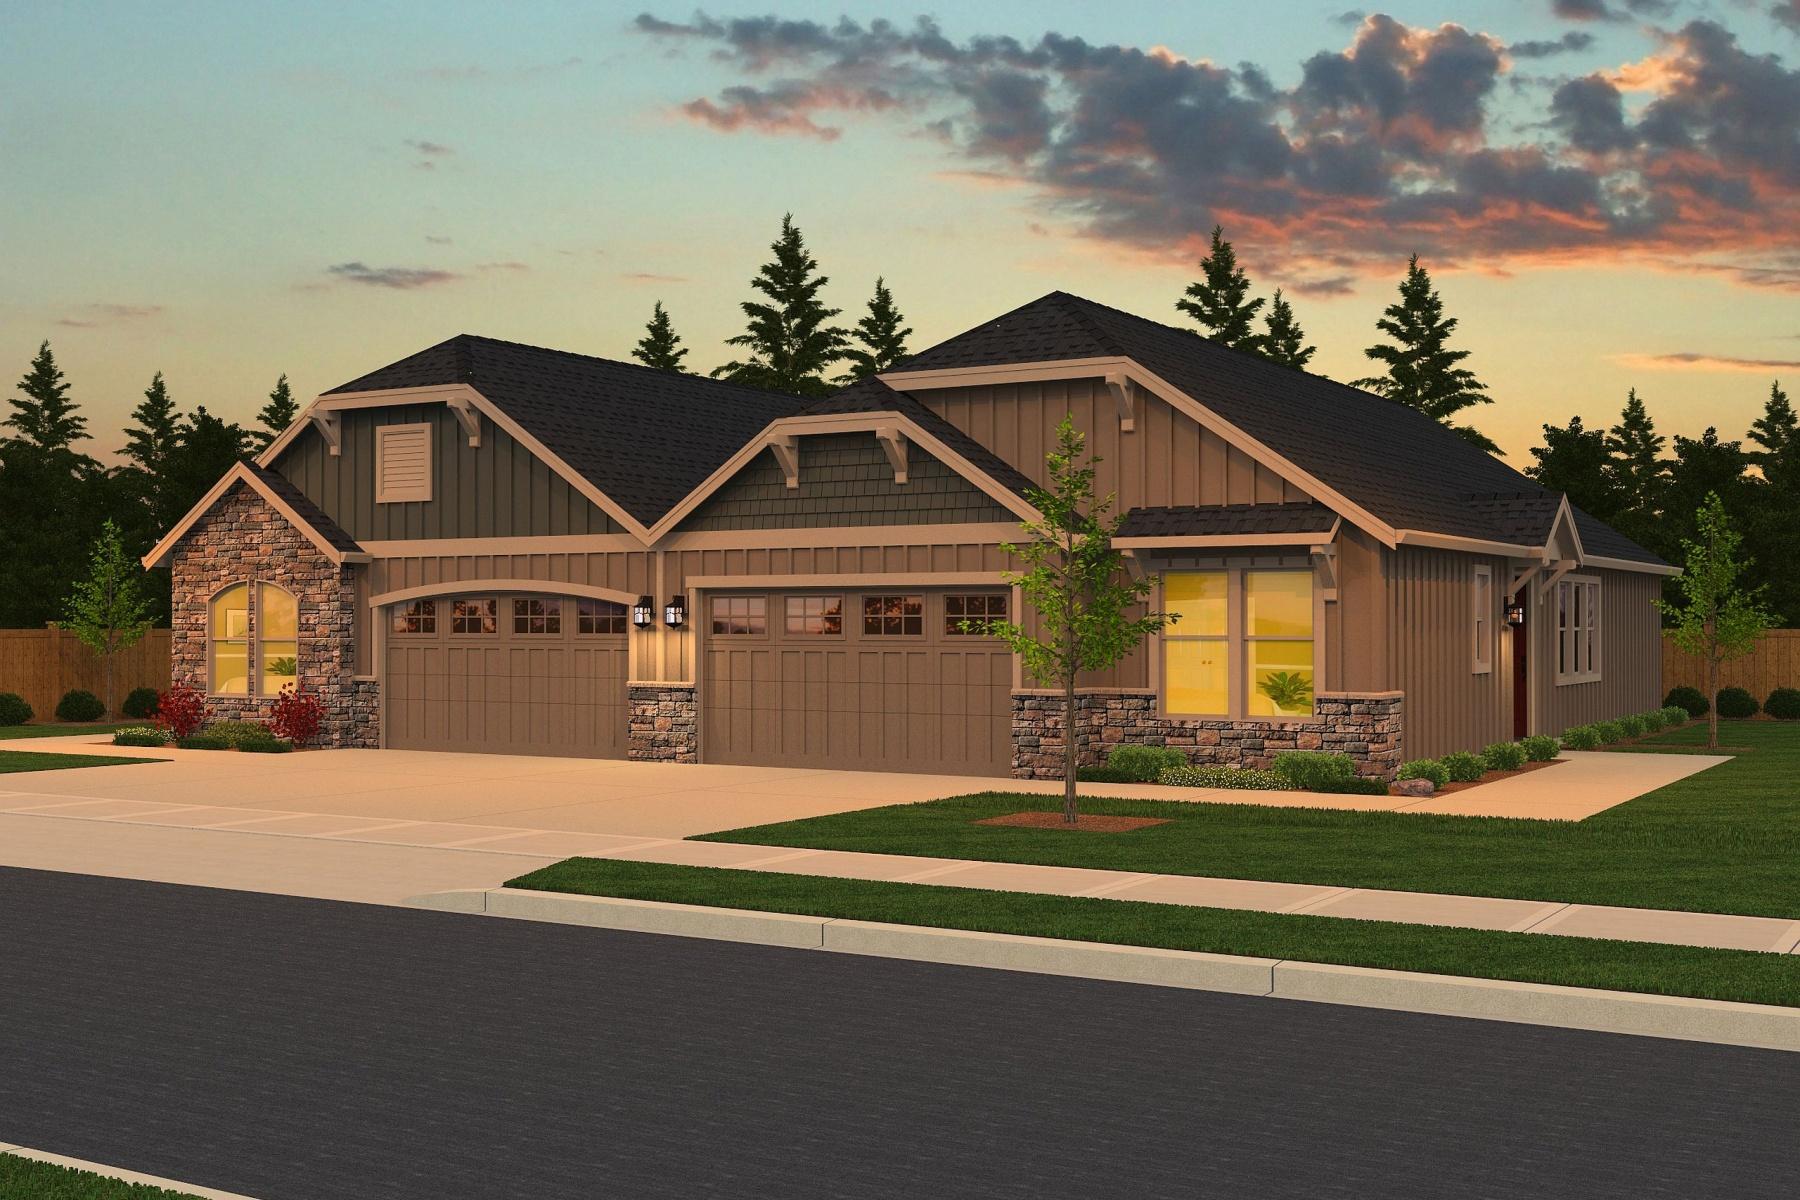 Single Family Home for Sale at 5803 NW 26th AVE, CAMAS, WA Camas, Washington 98607 United States